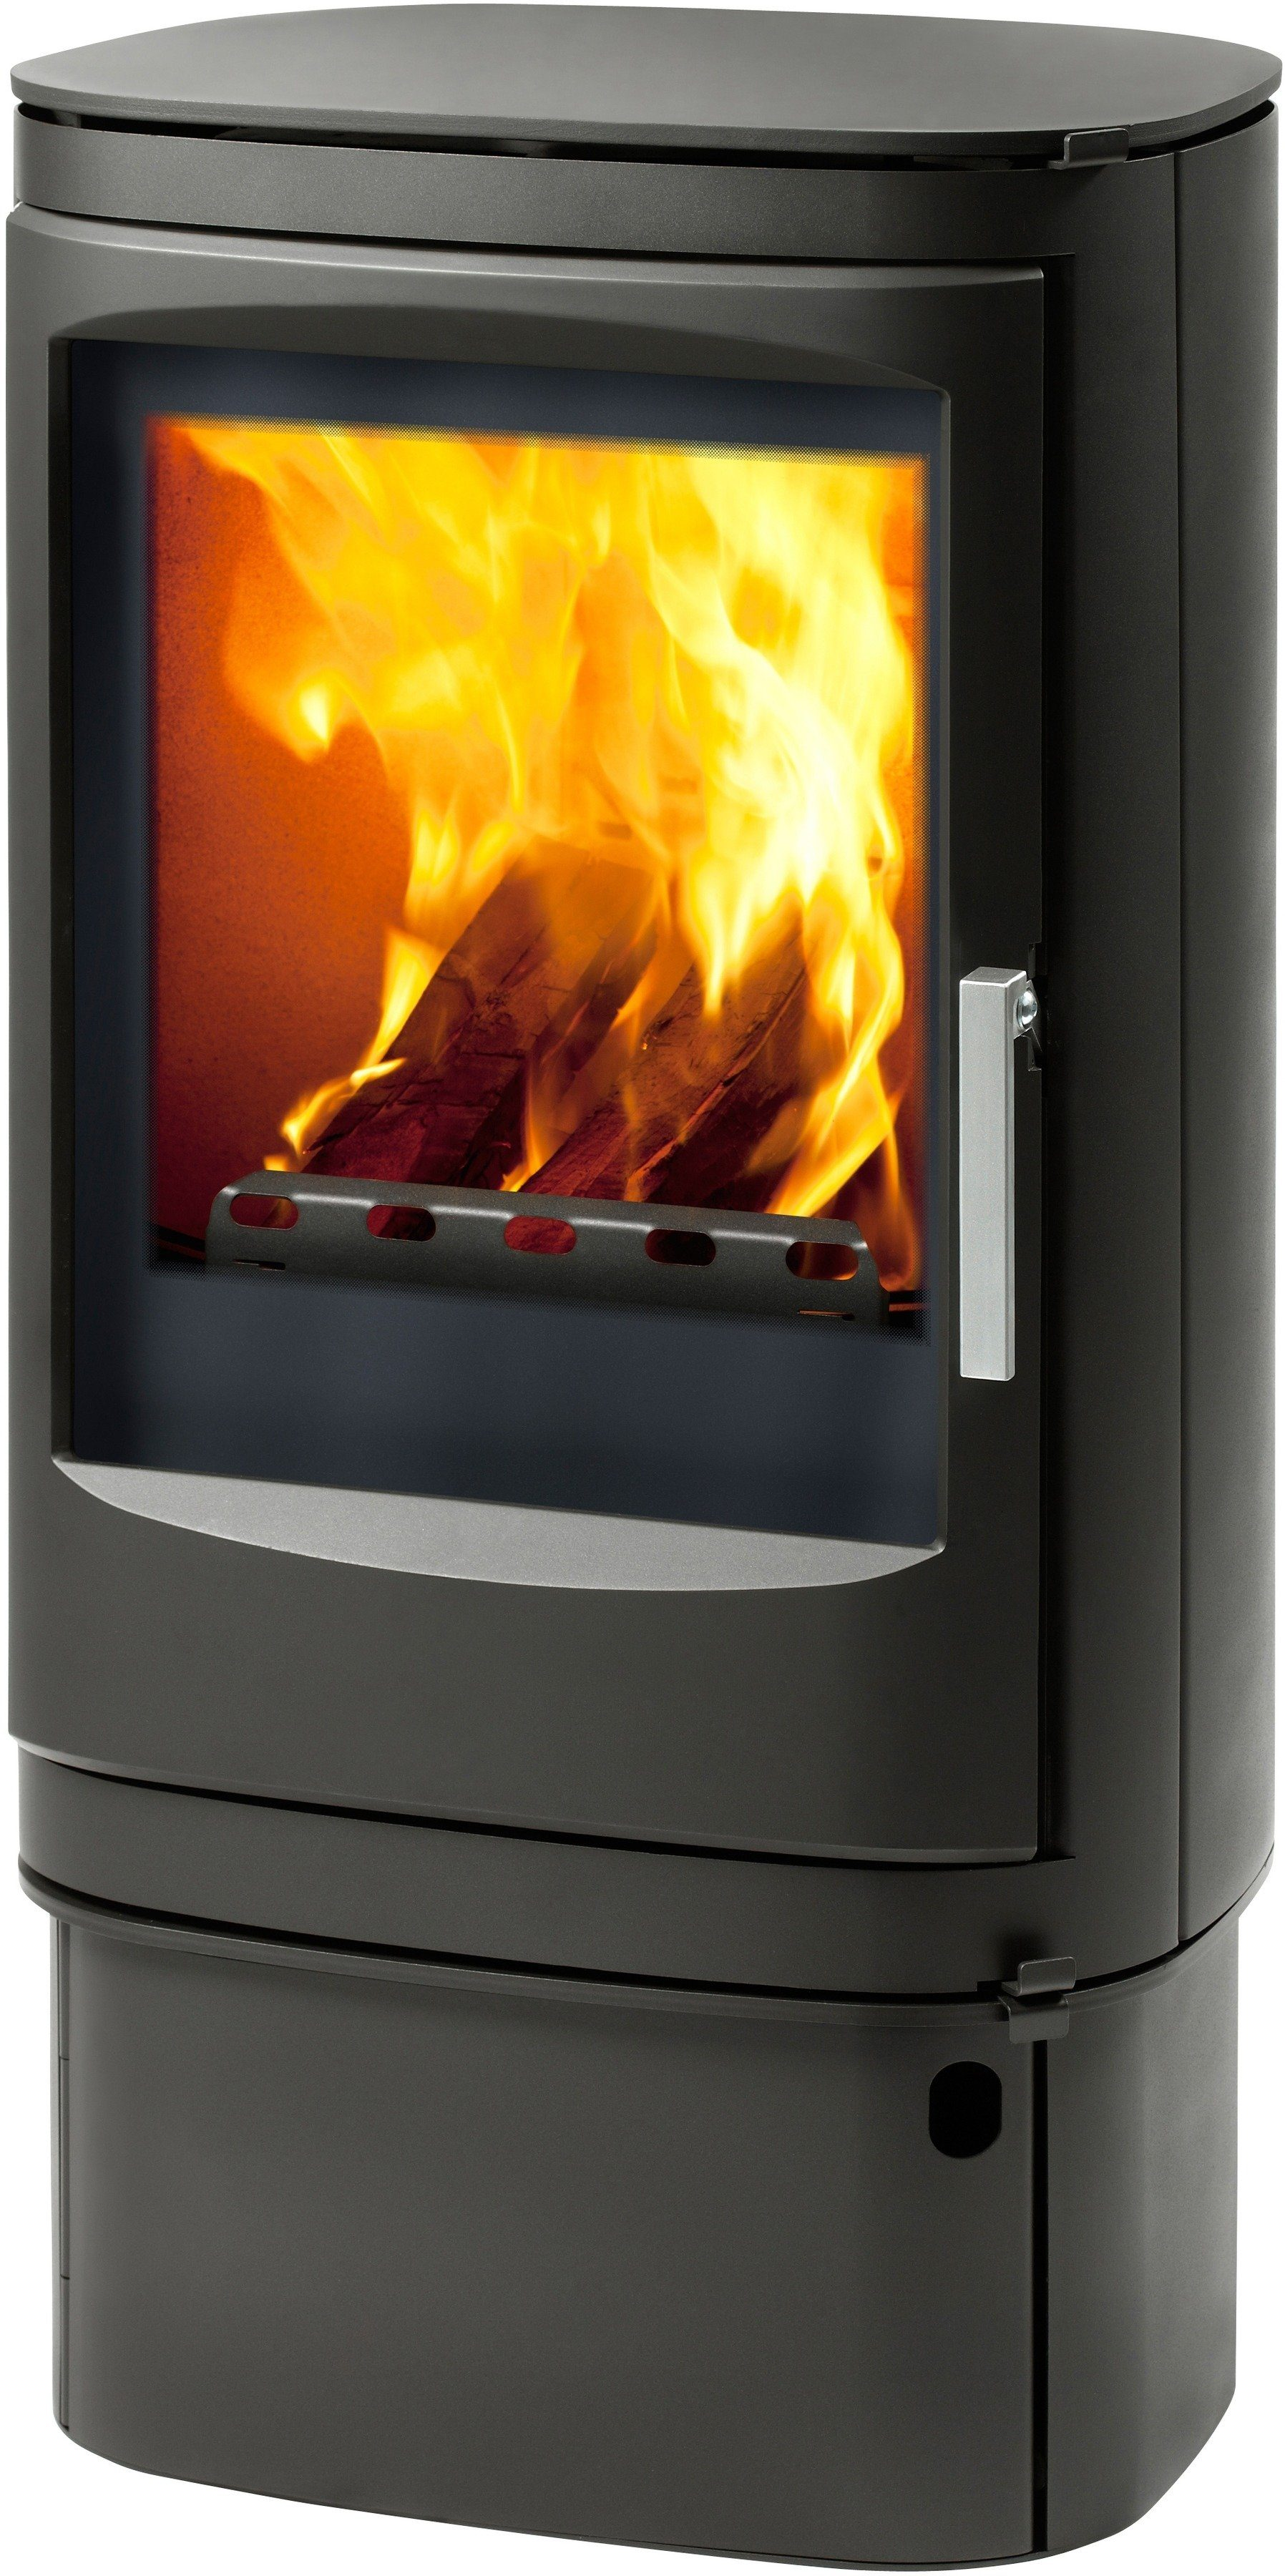 Varde Ovne Kaminofen »Fuego 1« 5 kW, externe Luftzufuhr